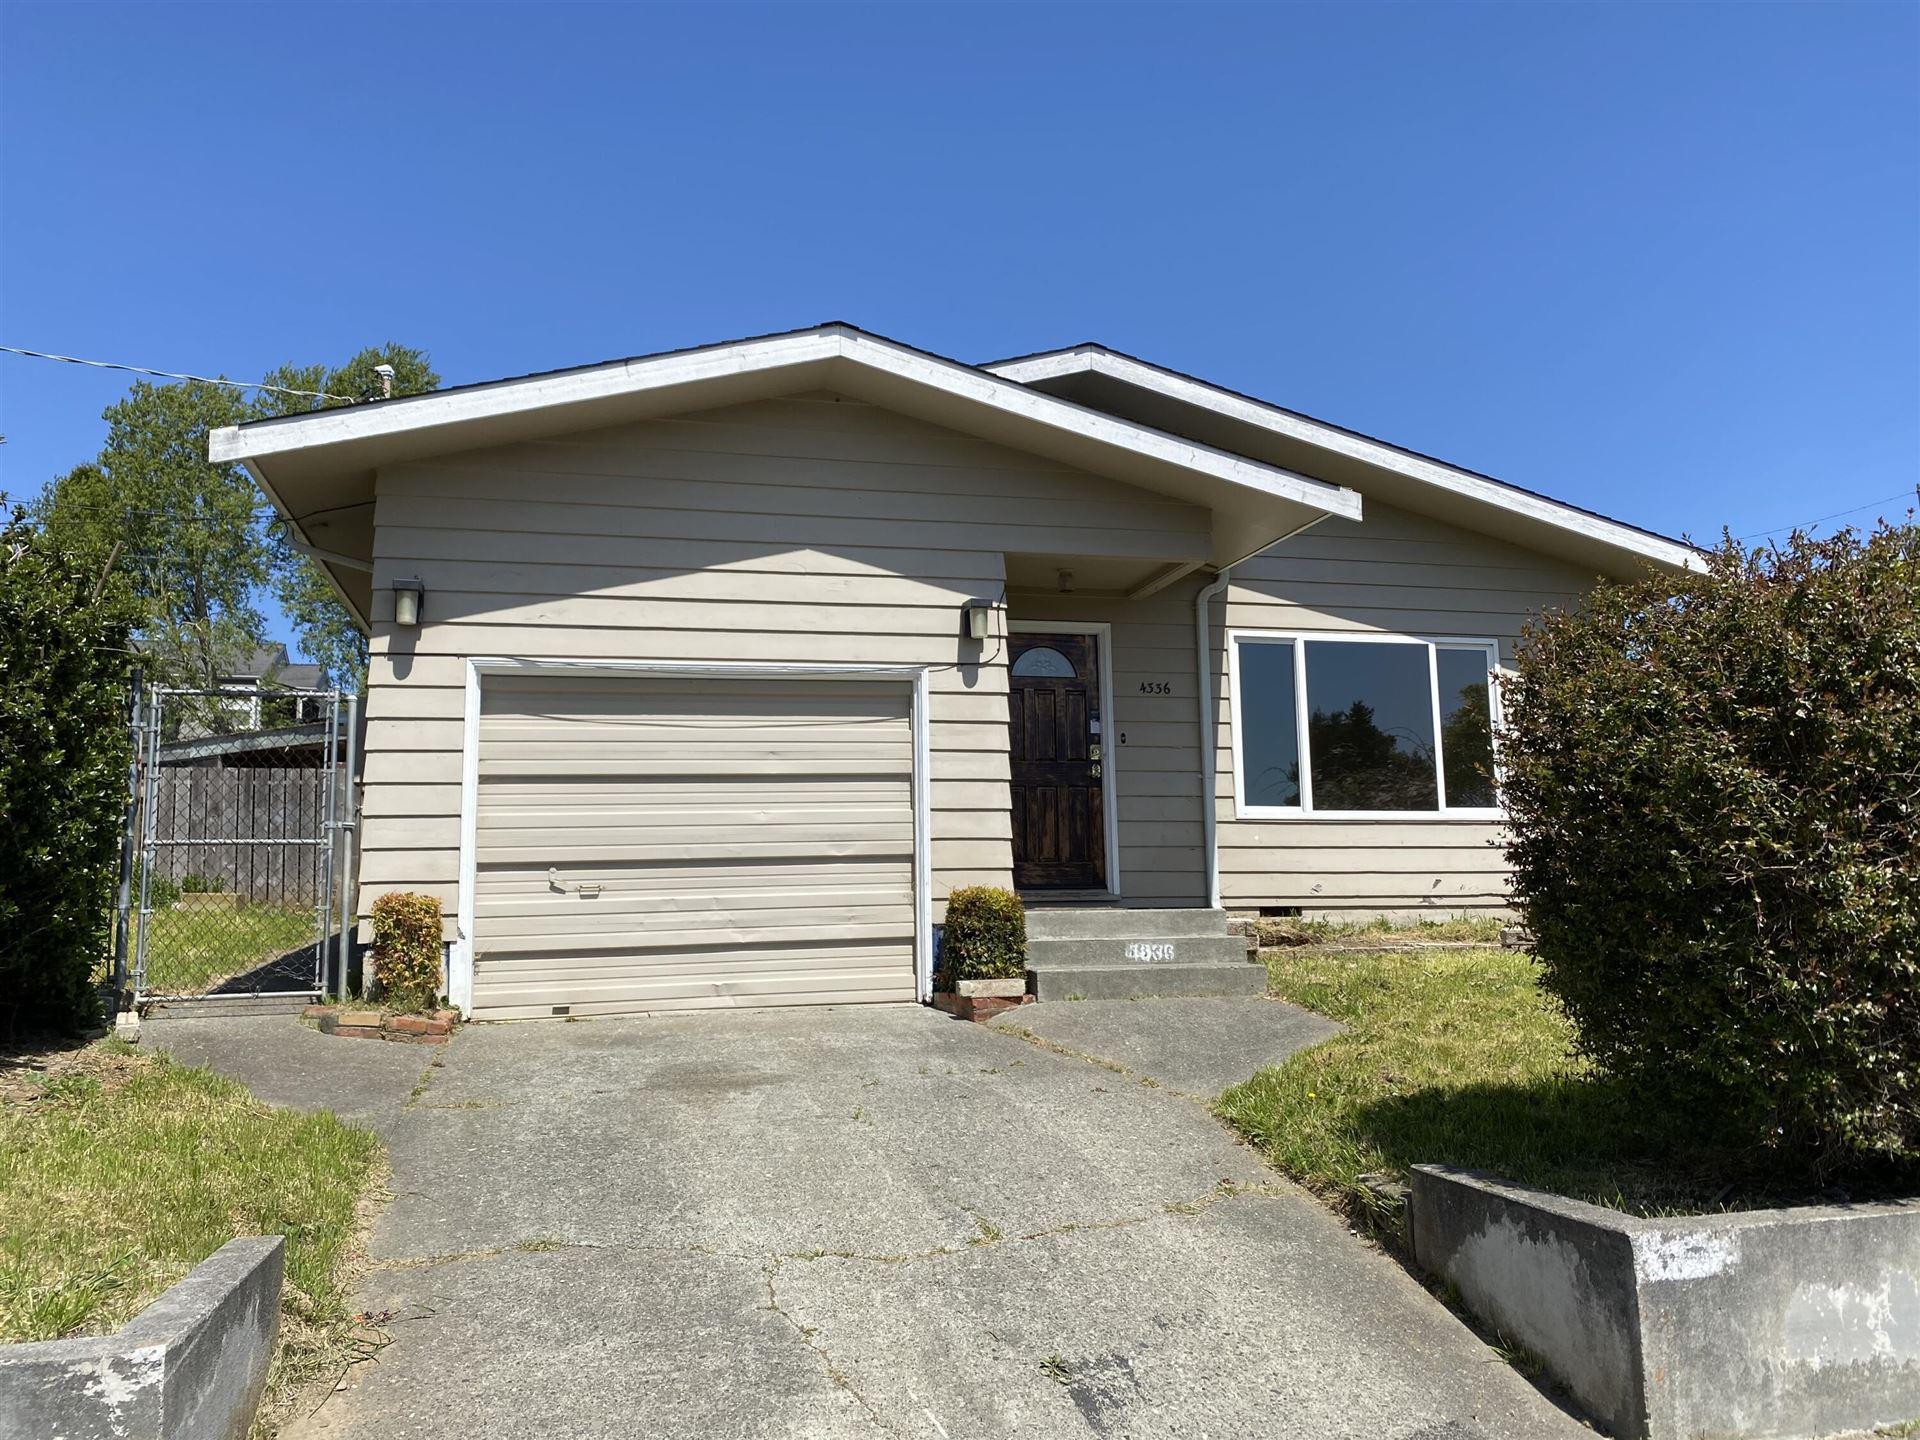 4336 Crestview Drive, Eureka, CA 95501 - MLS#: 258879